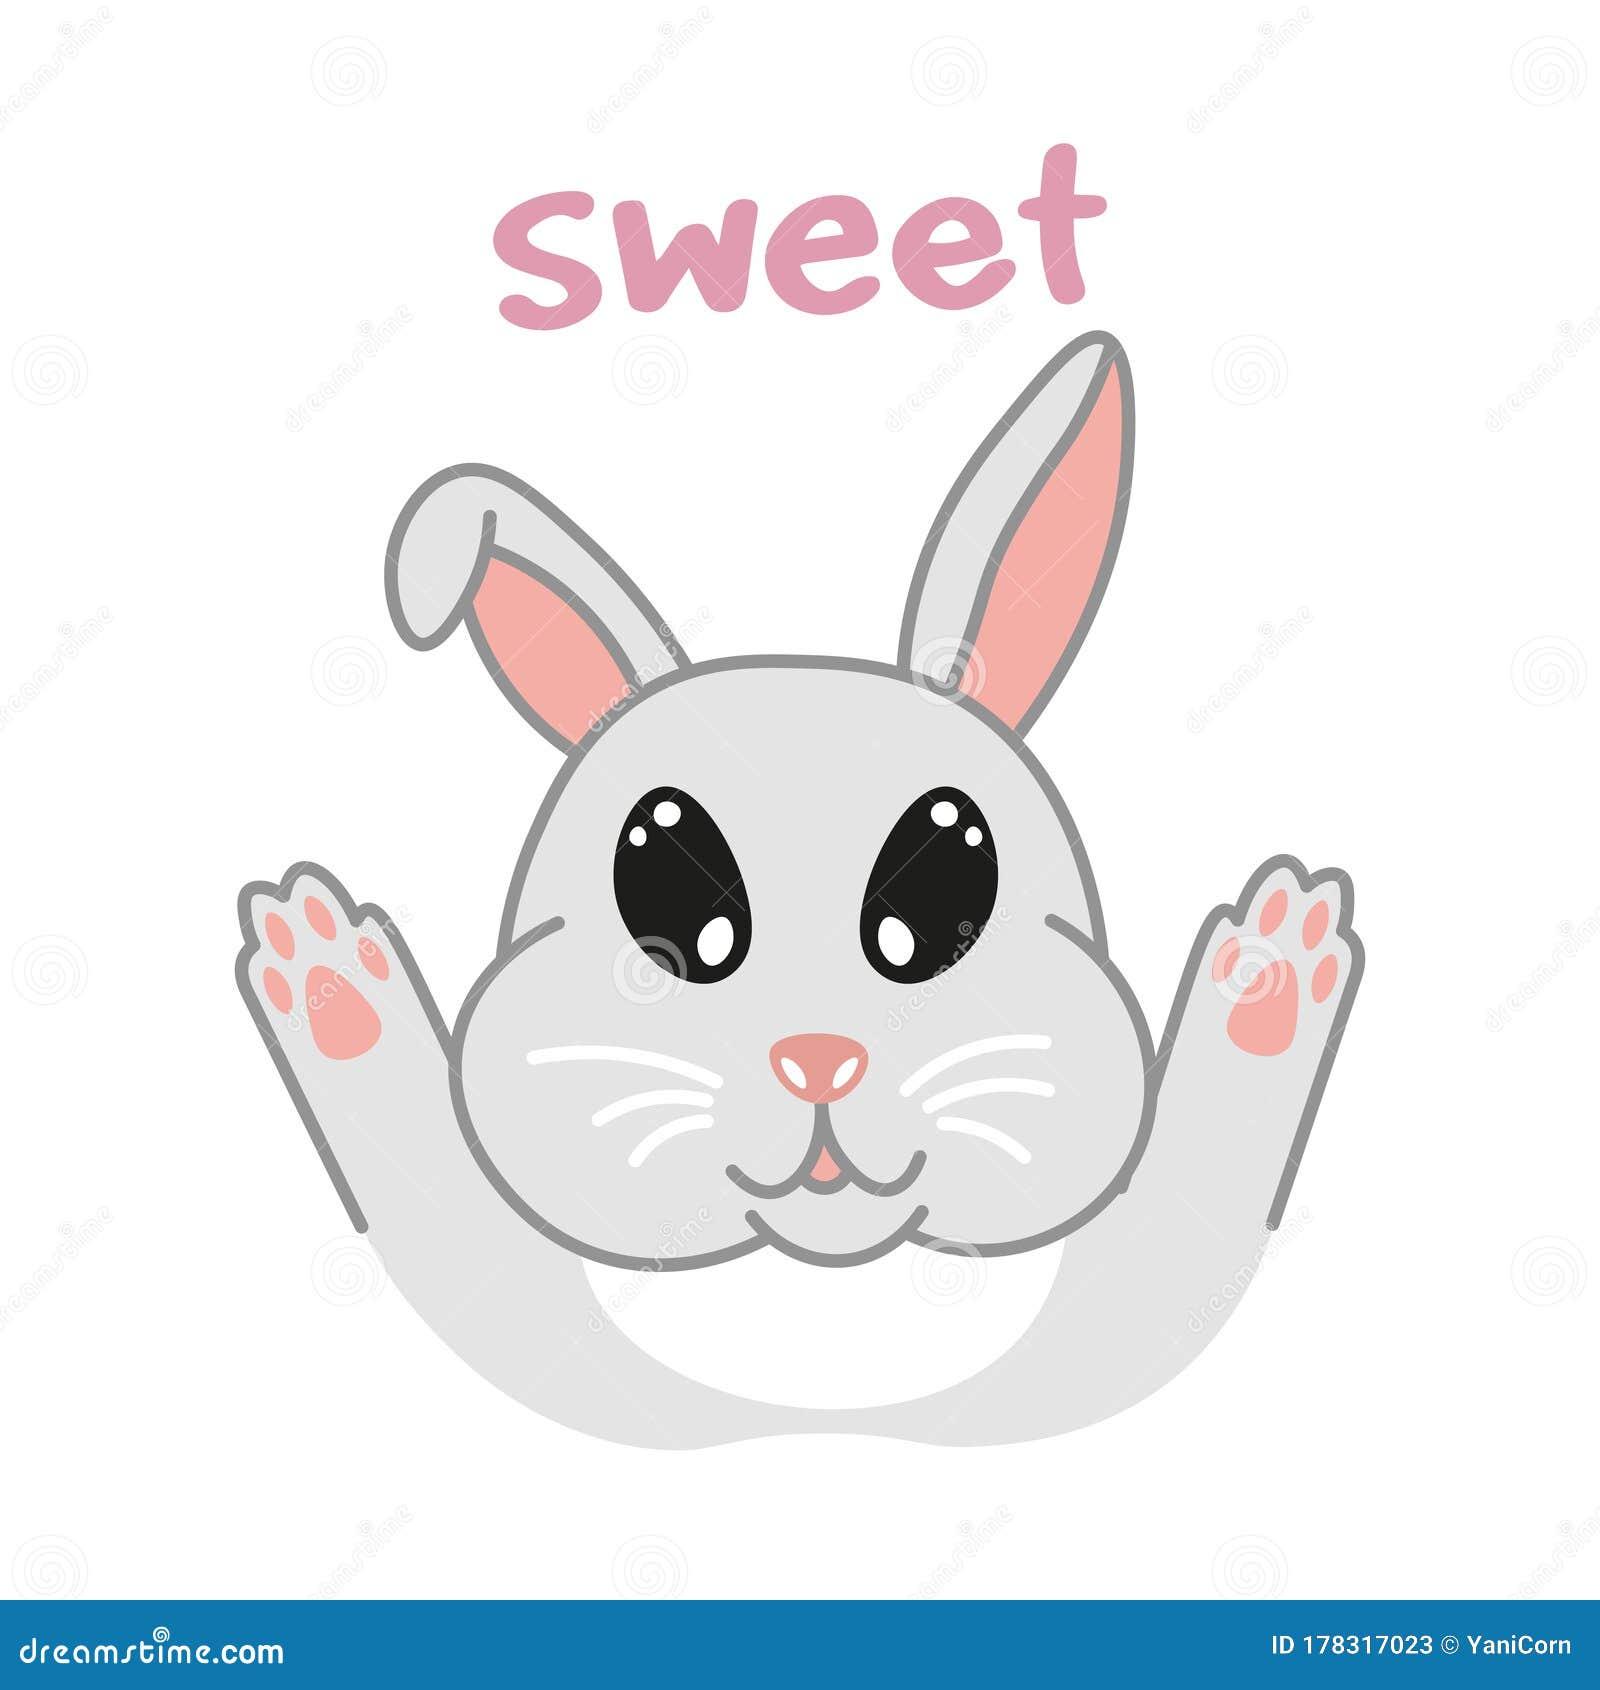 Kawaii Doodle Rabbit Bunny Cute Domestic Animal Lovely Cartoon